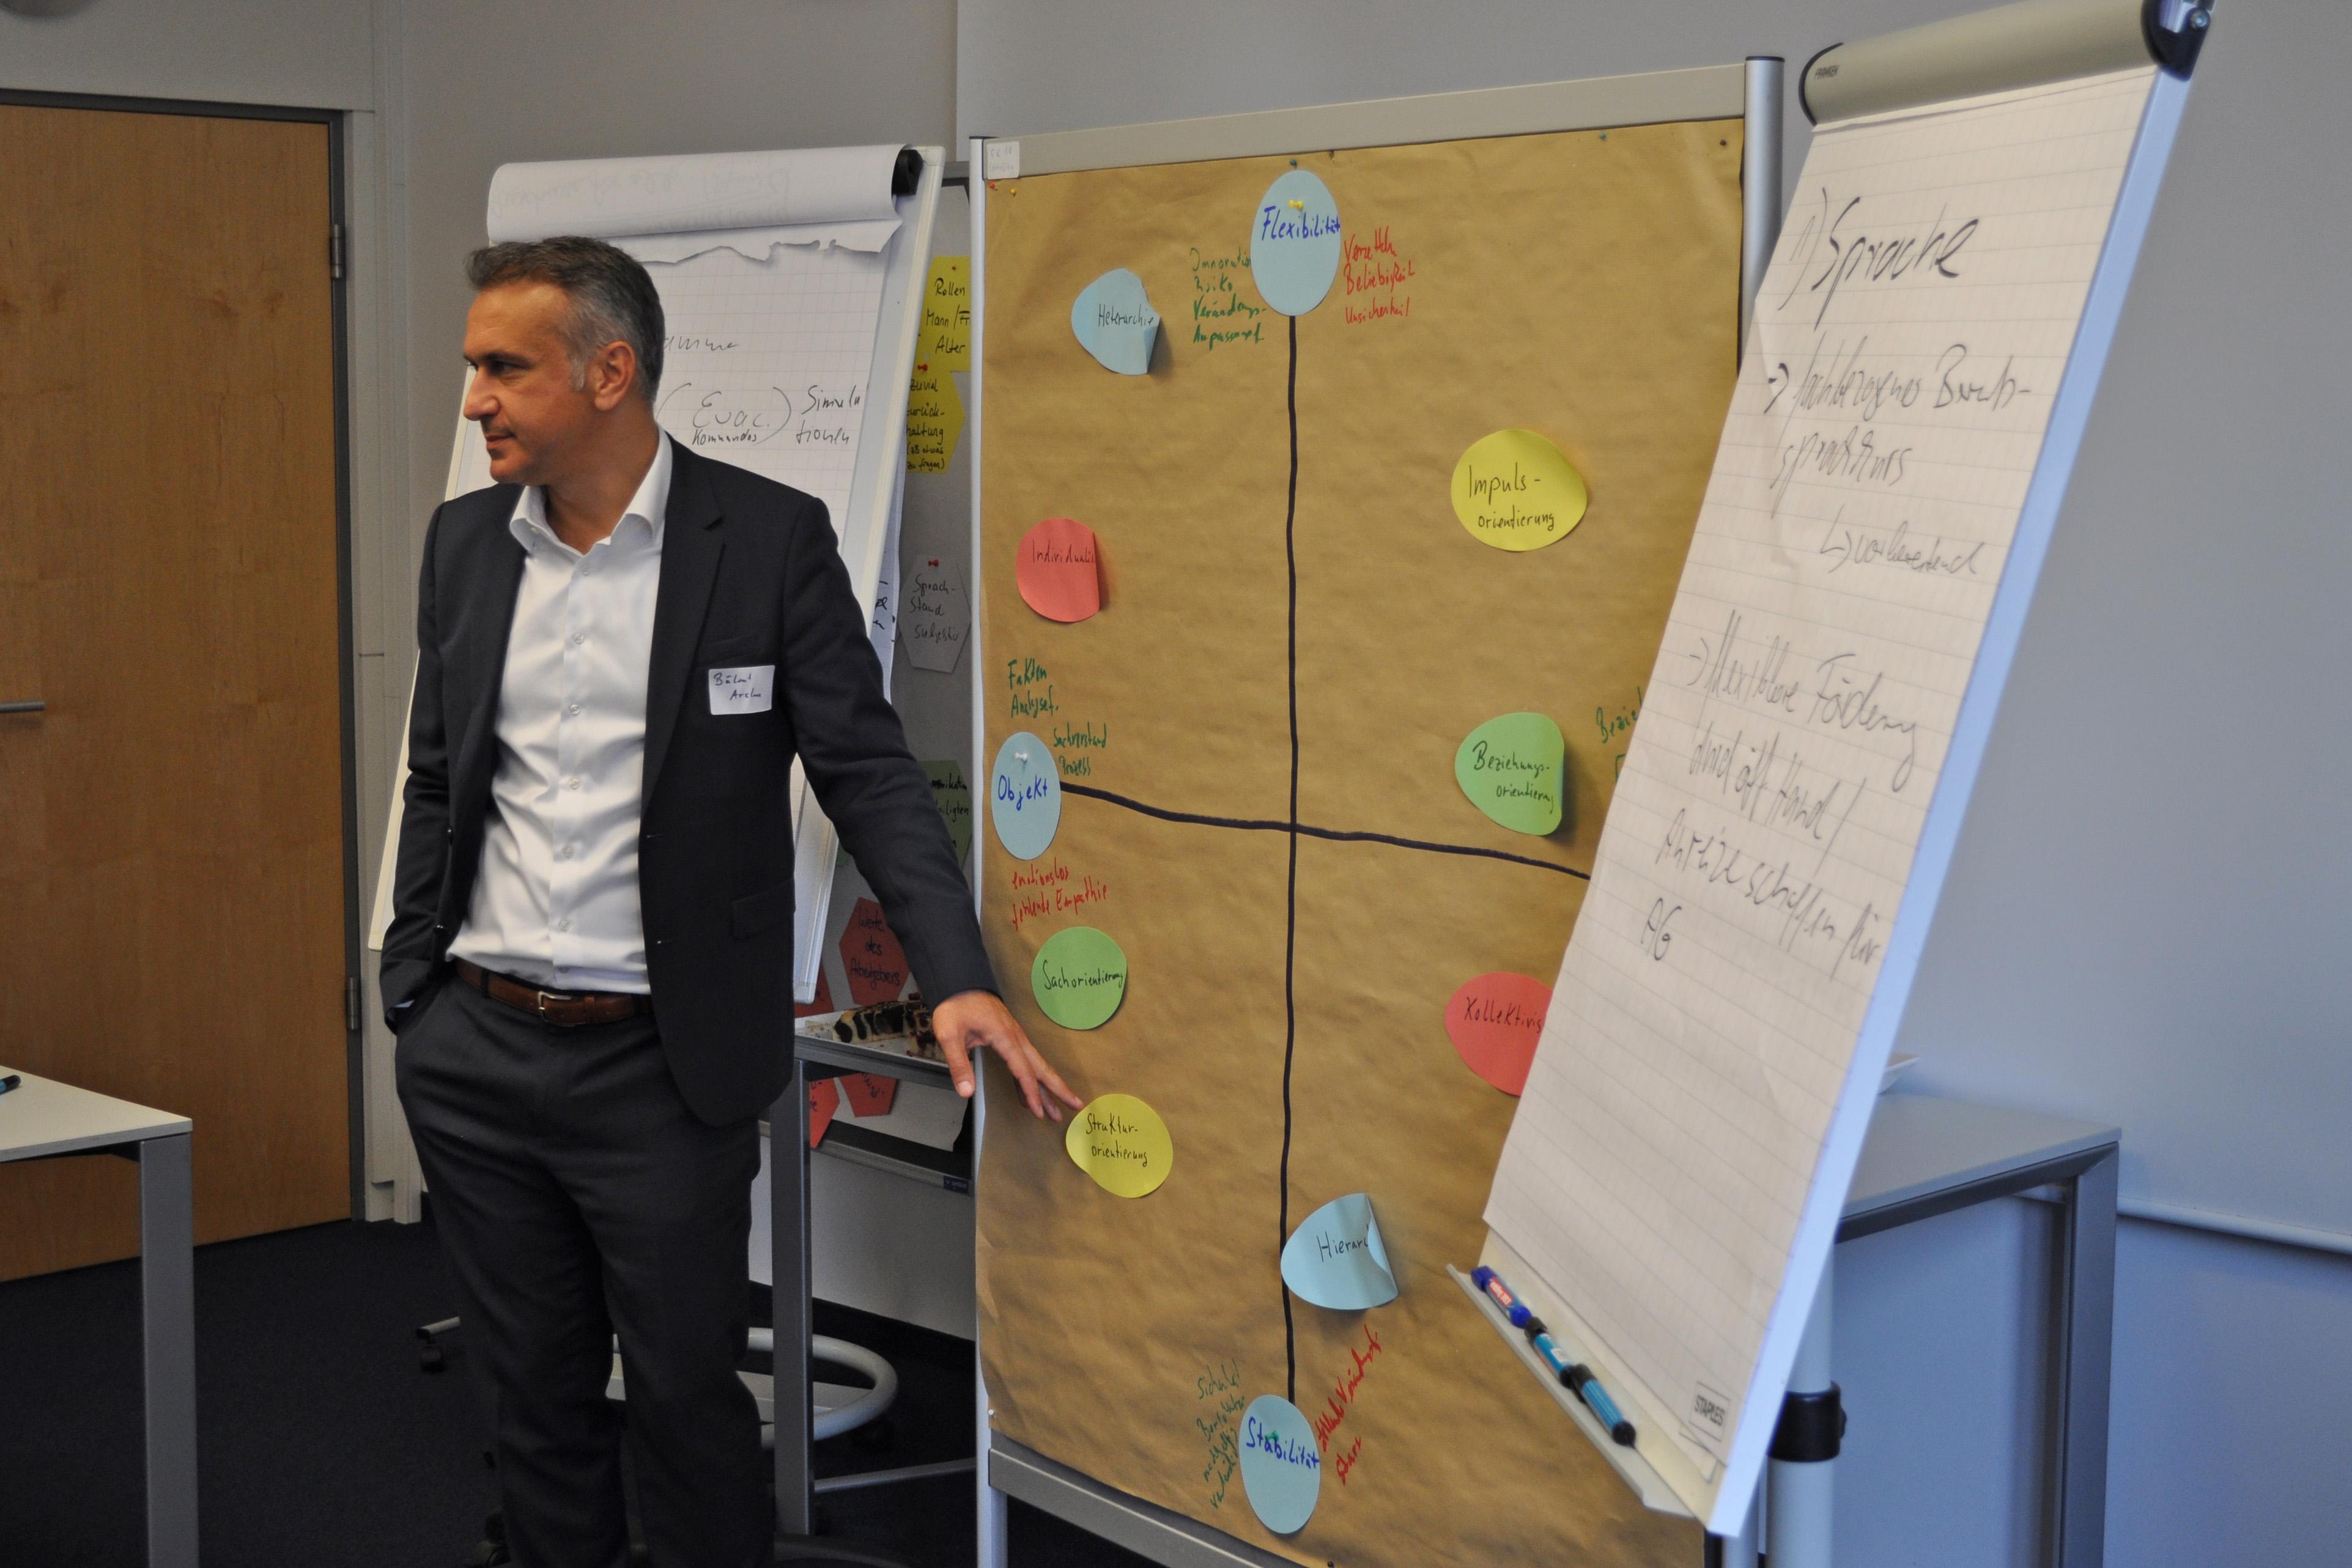 Ideenworkshop in Eschborn: Arslan stellt Kulturmodell vor